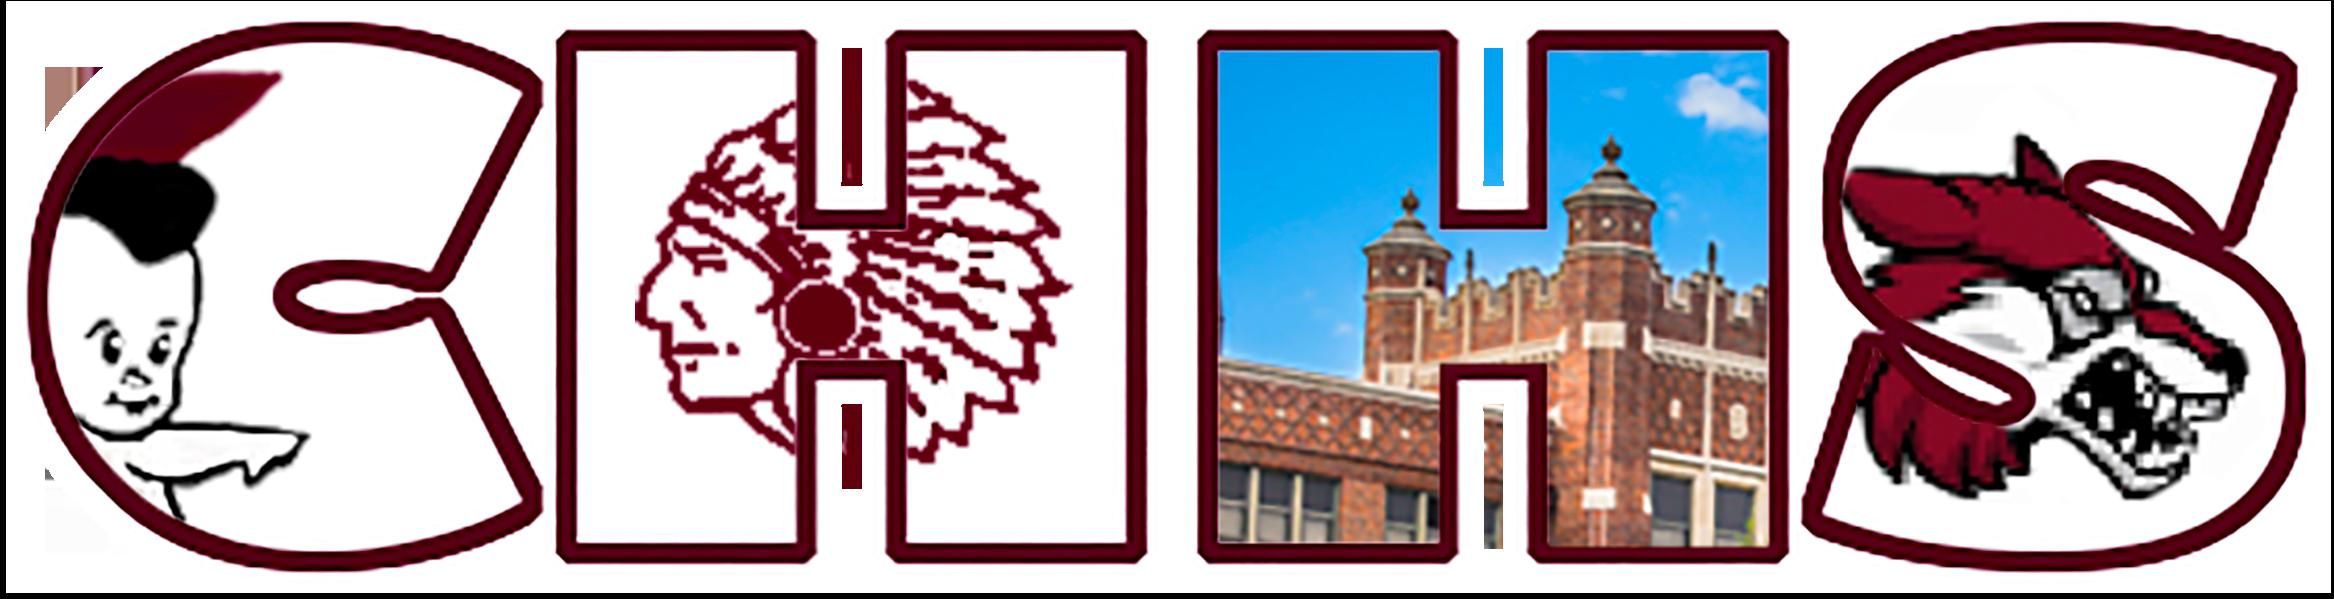 Capitol Hill High School Alumni Hall of Fame Association